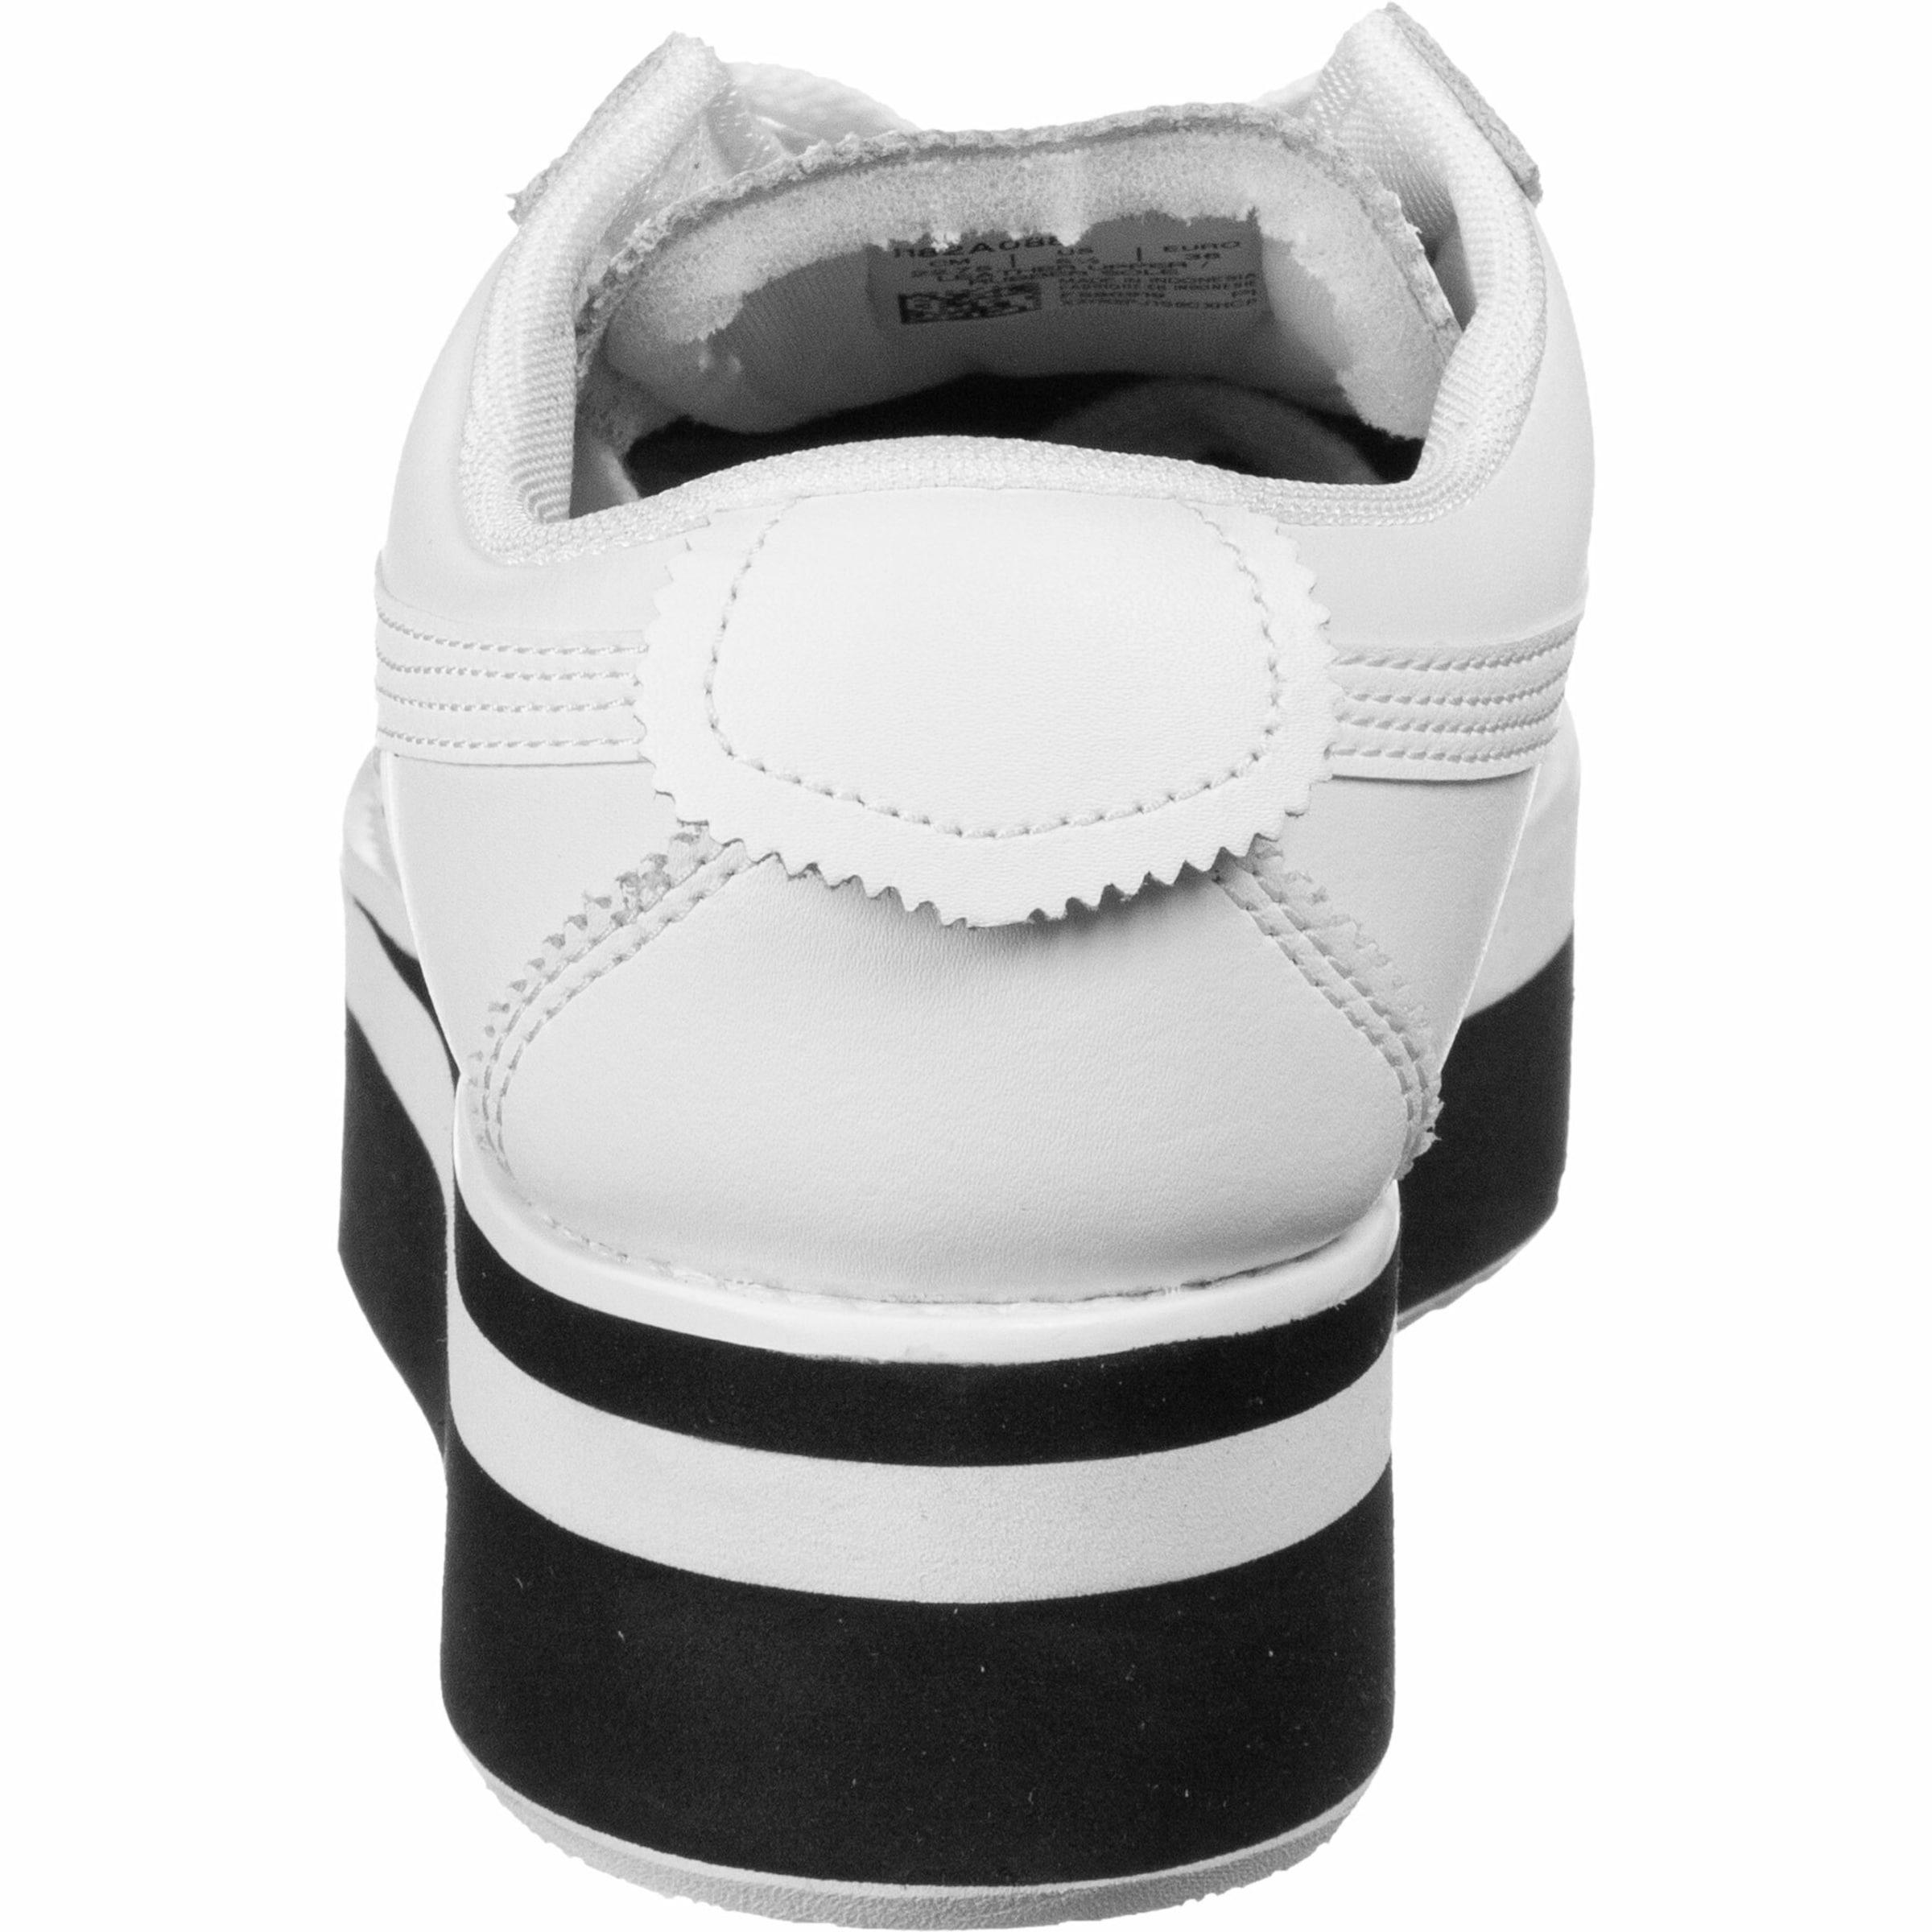 Onitsuka Tiger Schuhe in weiß